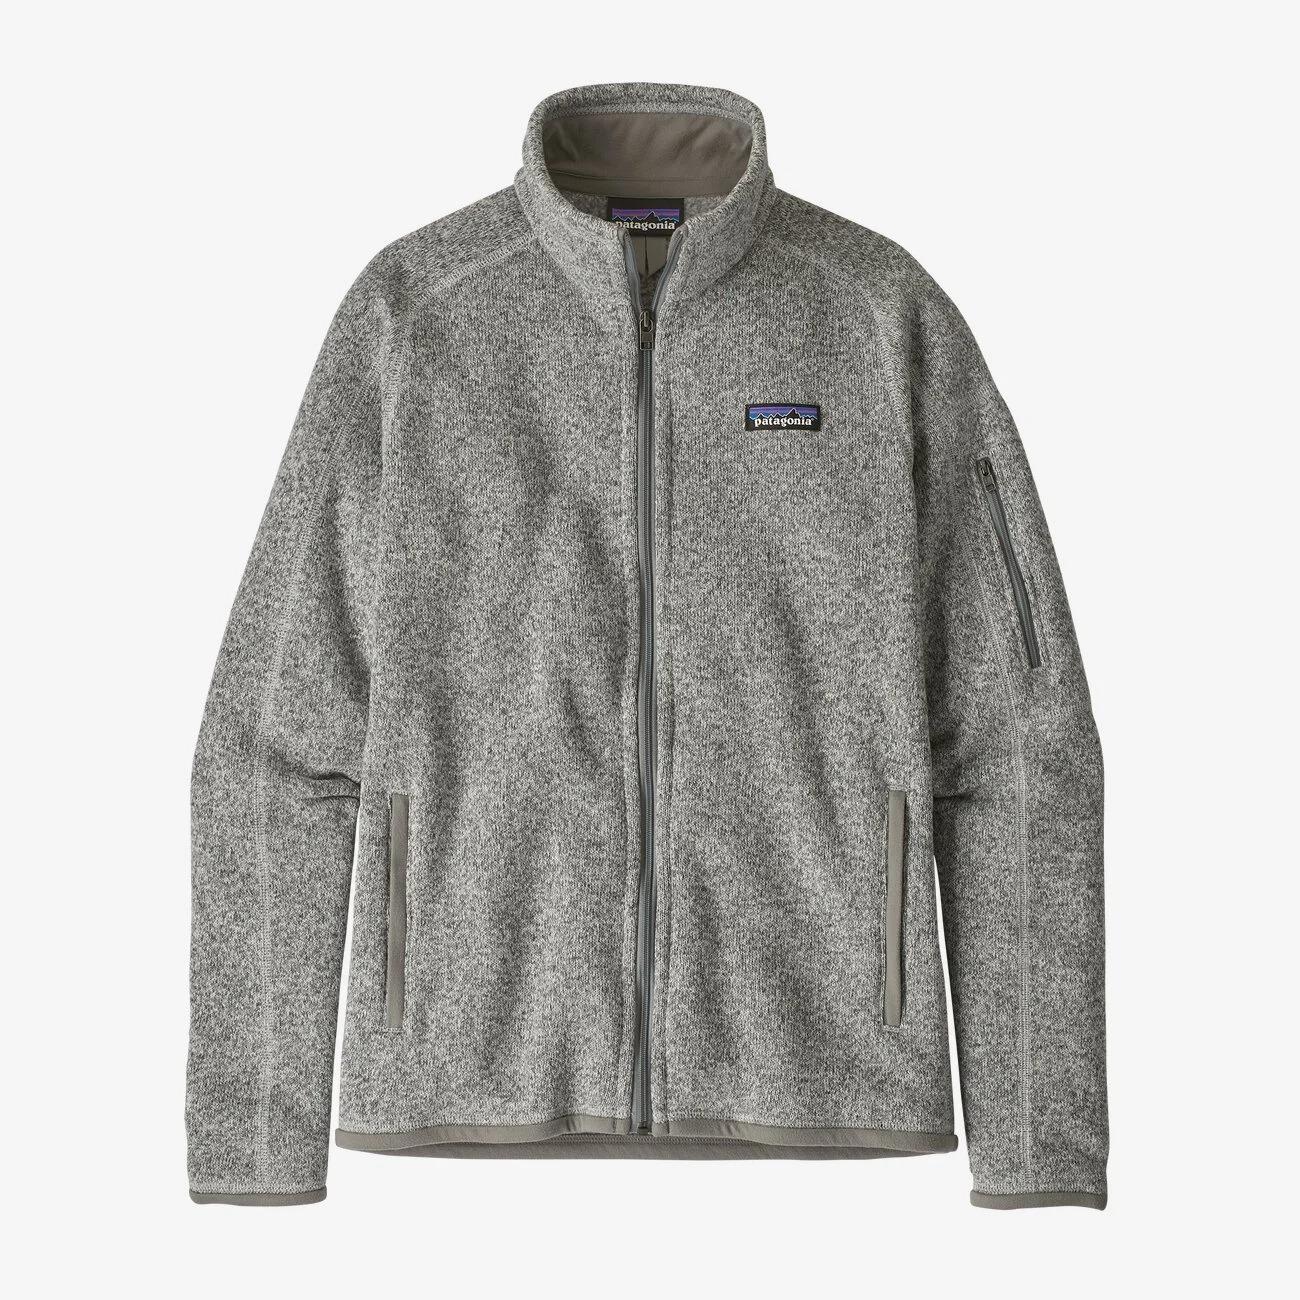 Braasport Patagonia Better Sweater Jacket, fleecejakke herre